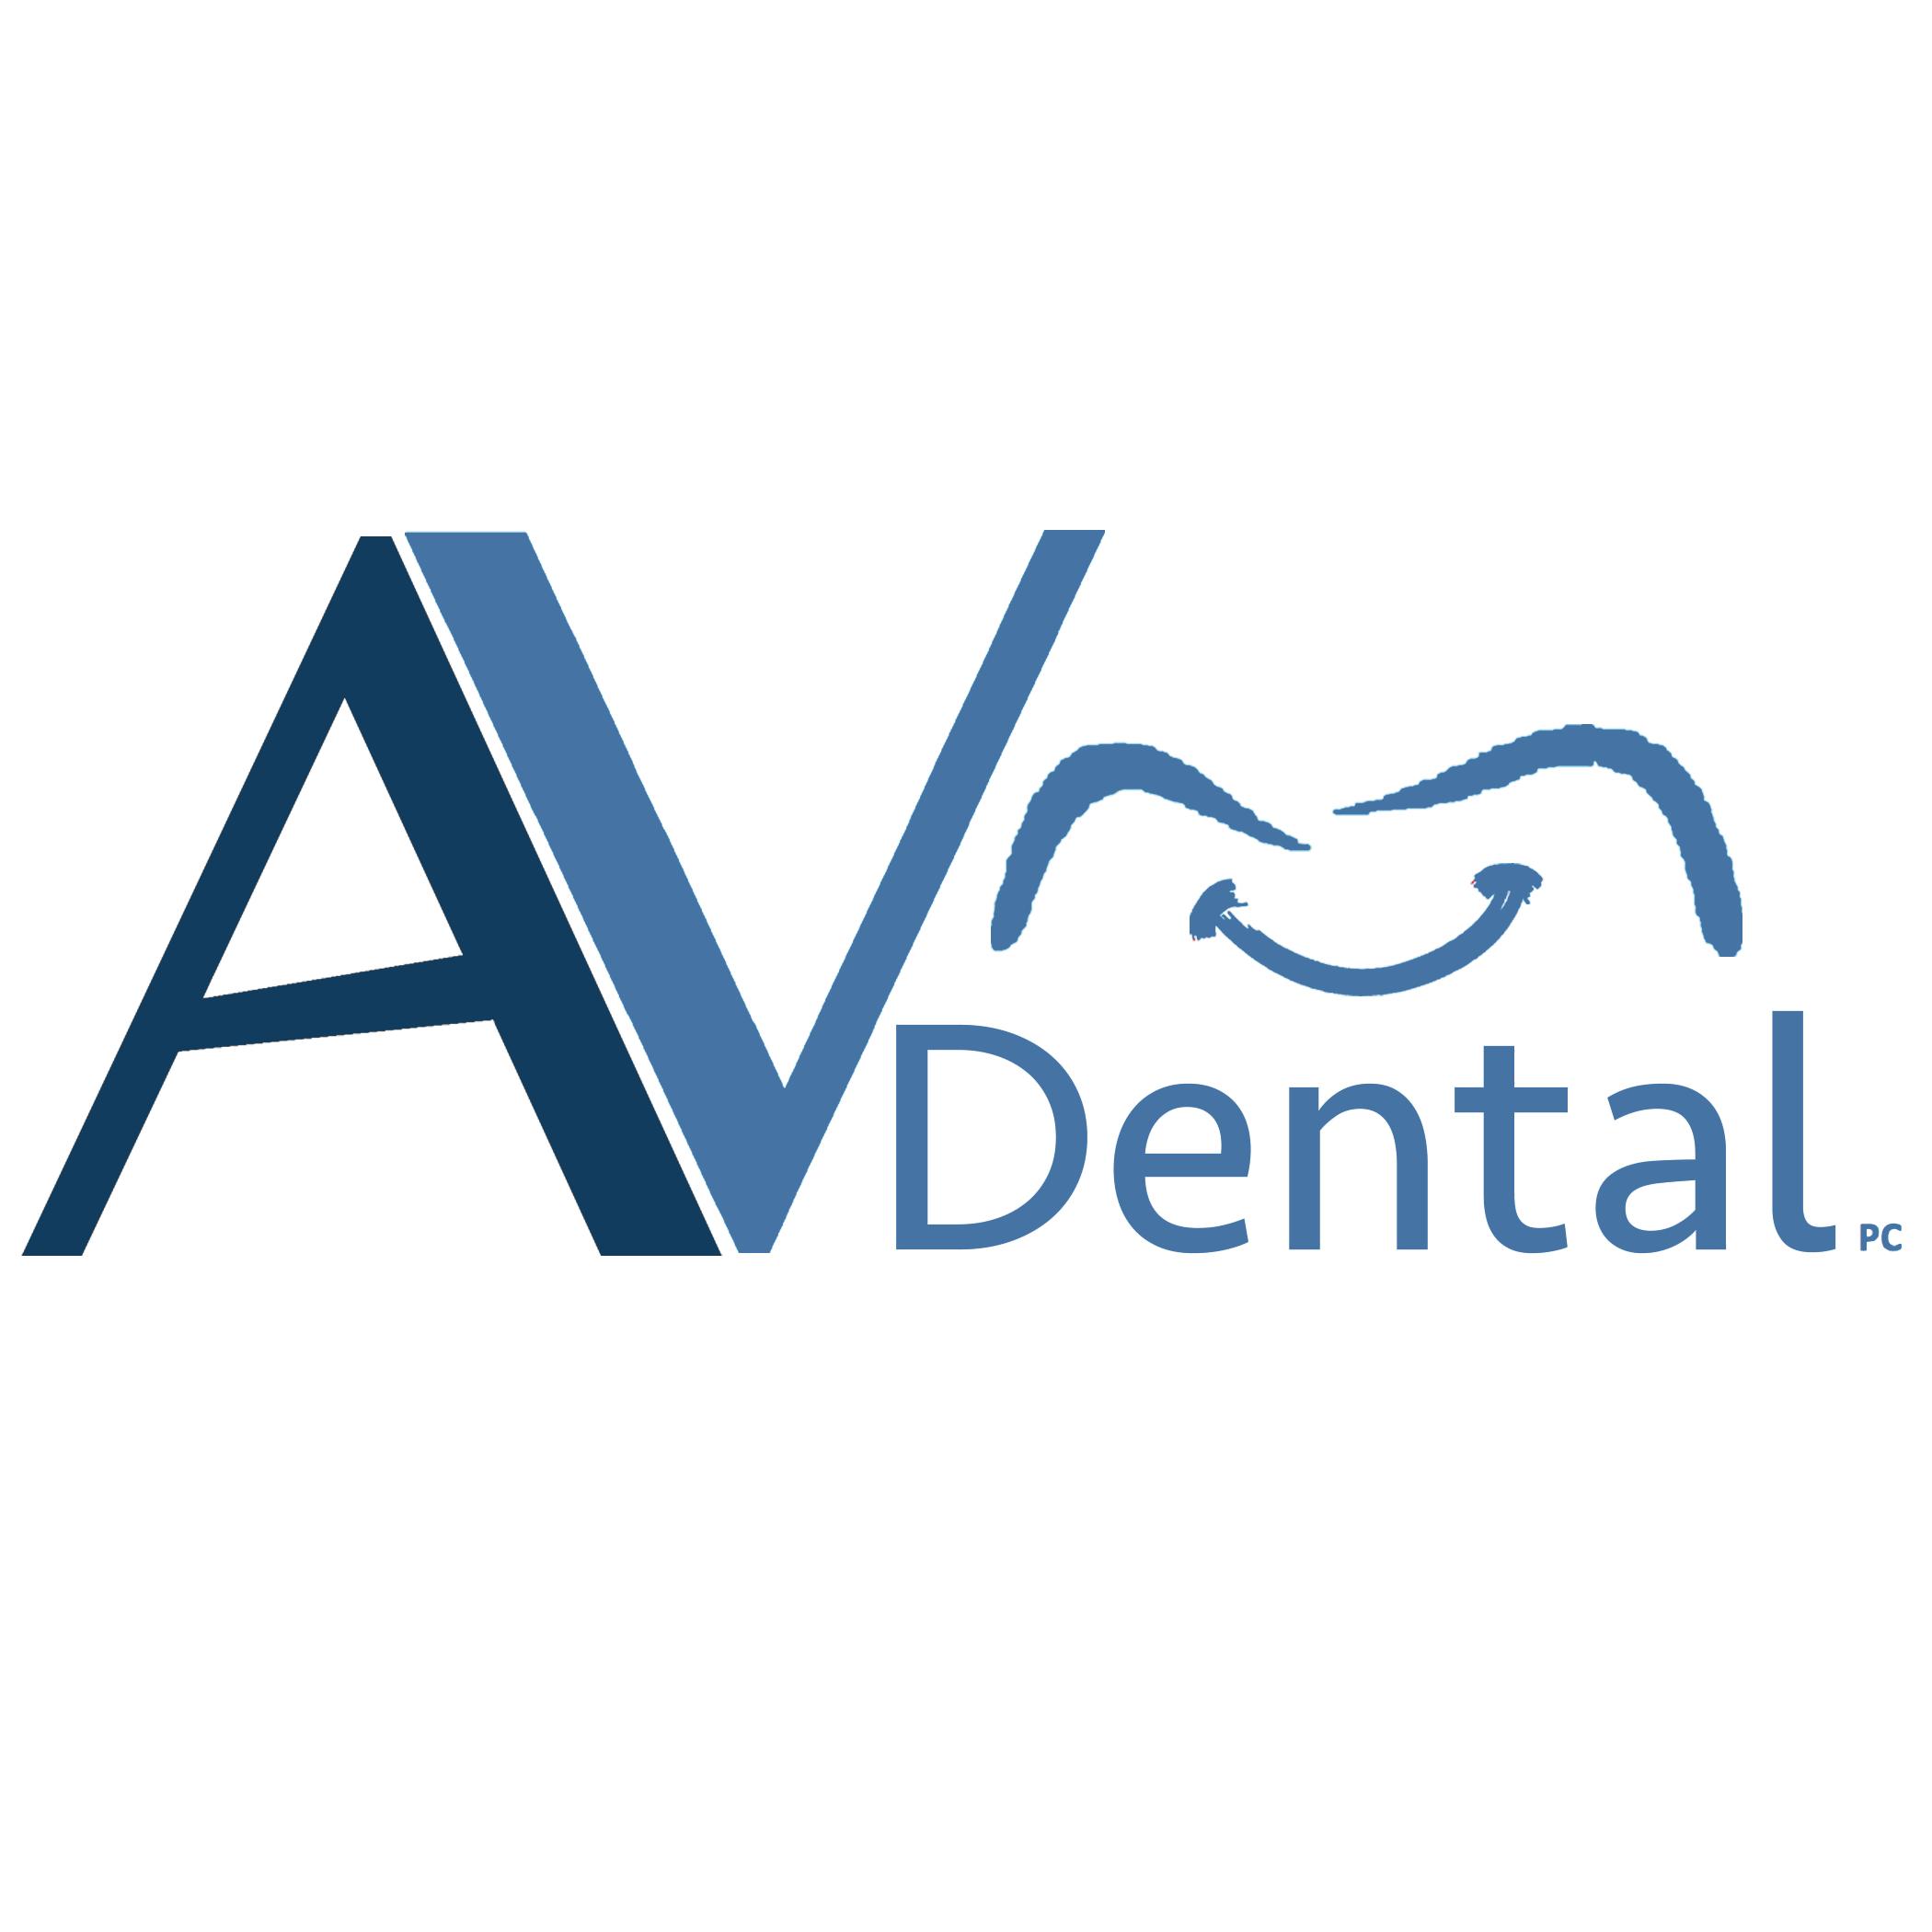 AV Dental